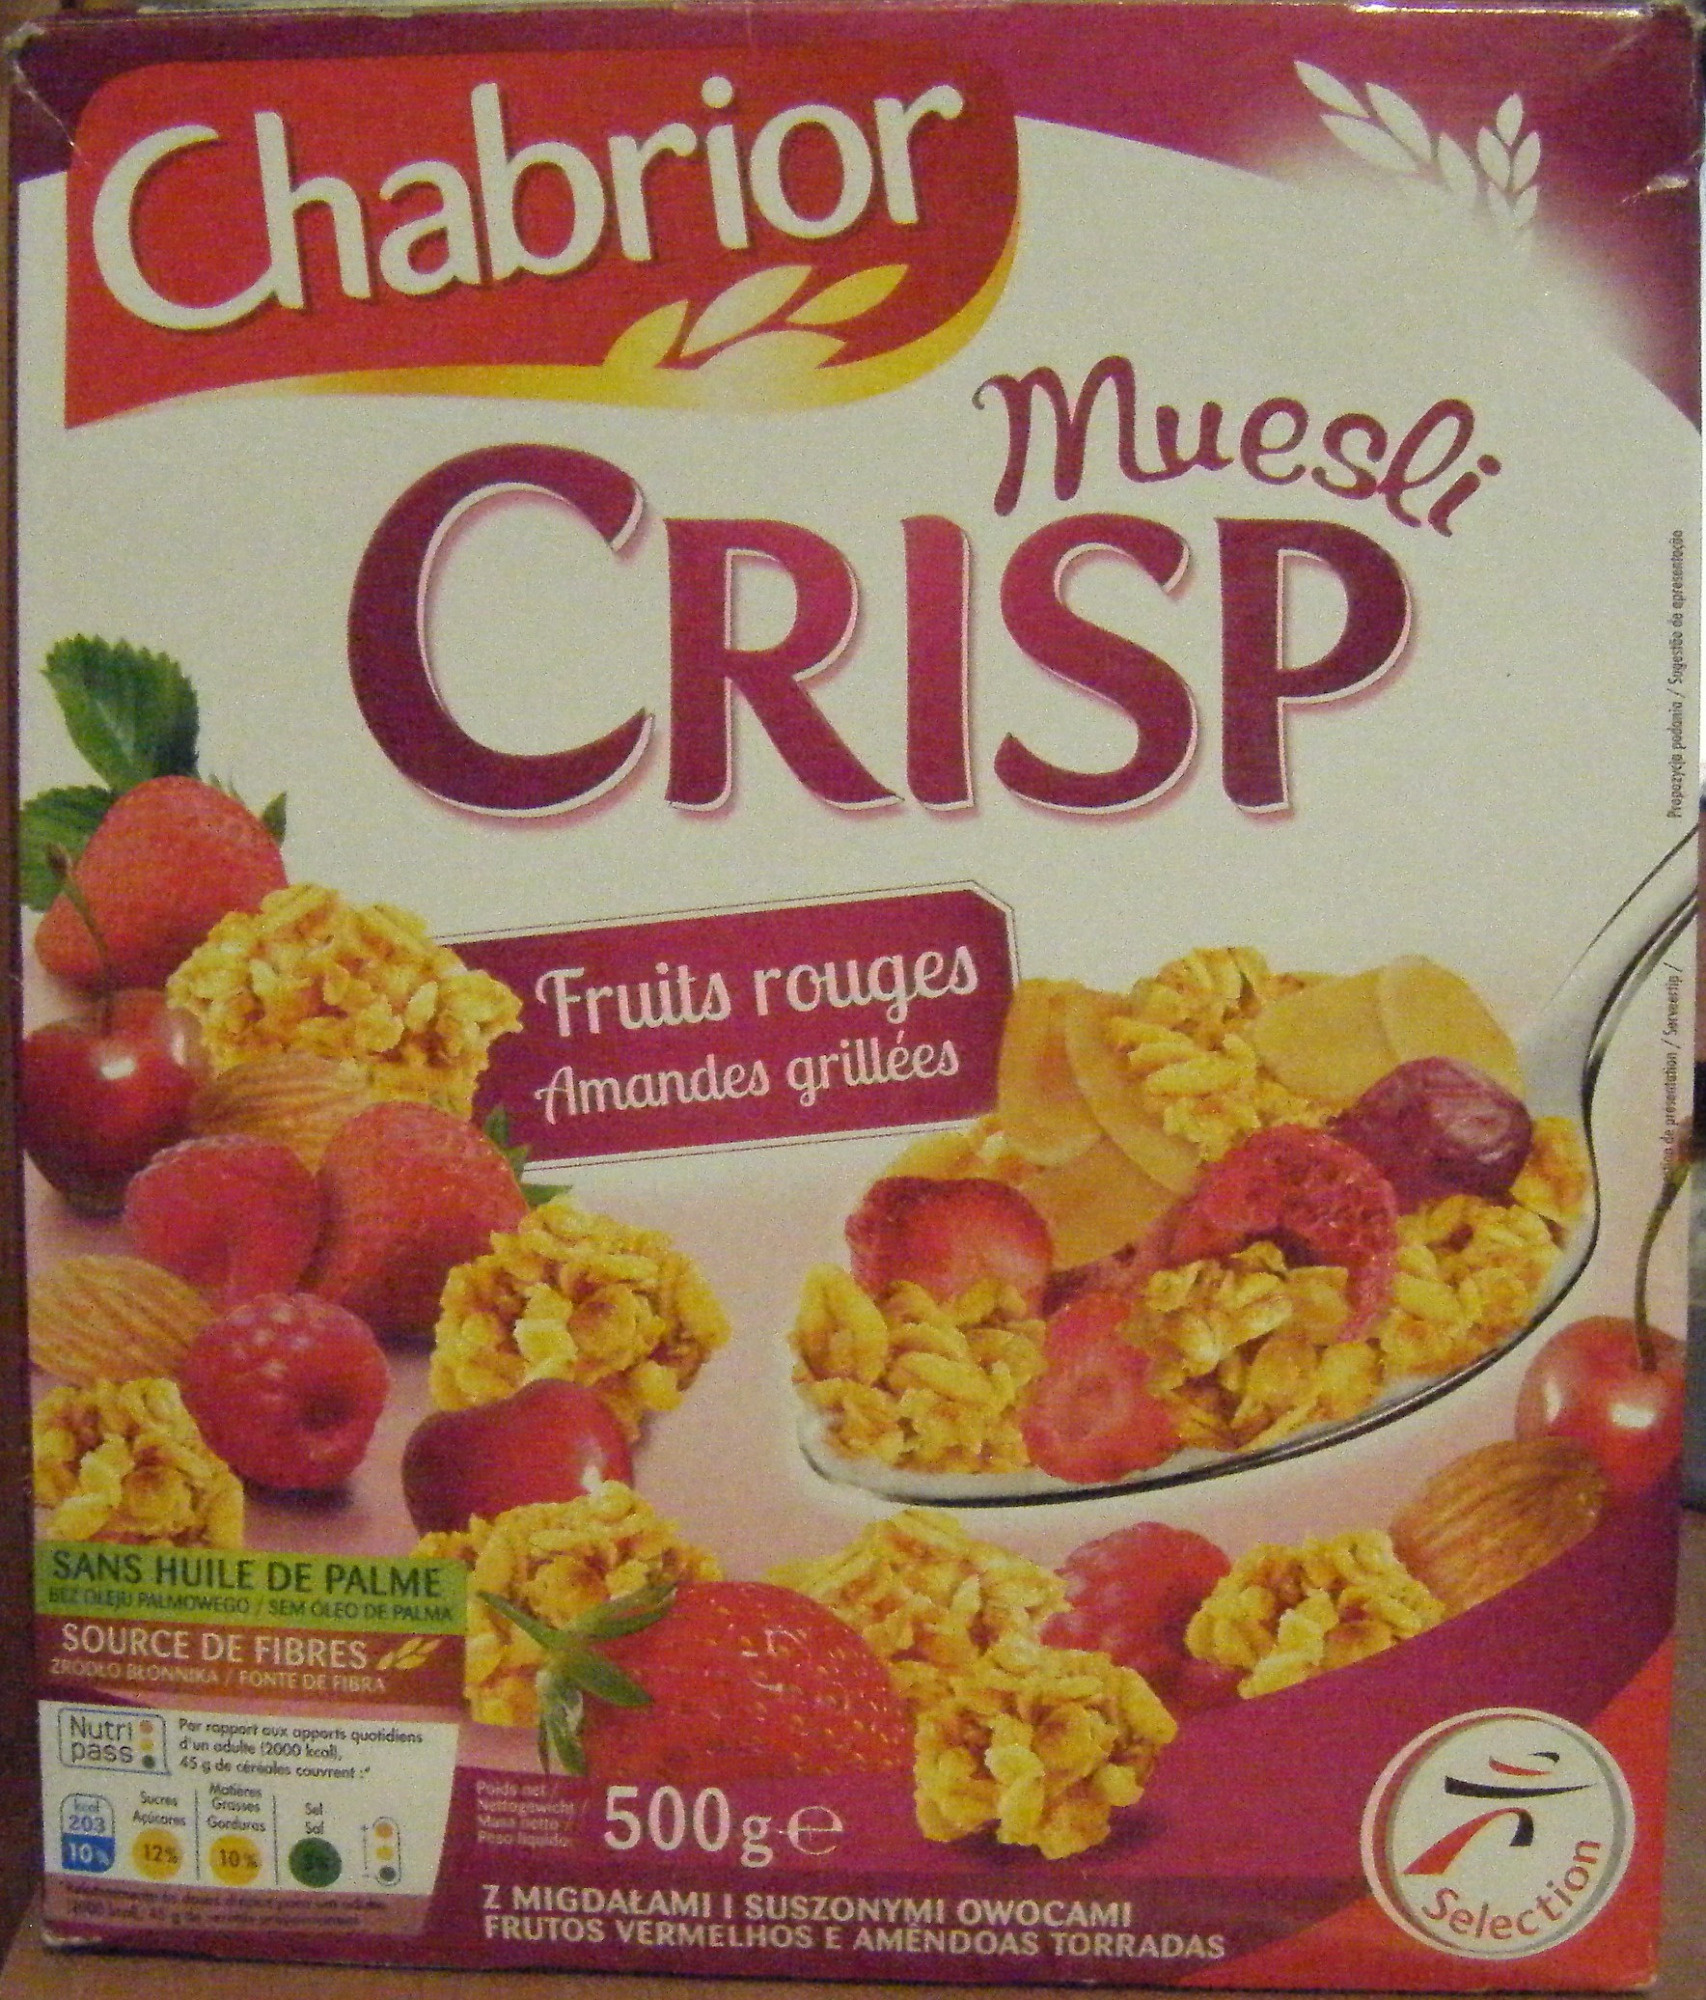 Muesli CRISP Fruits rouges Amandes grillées - Product - fr